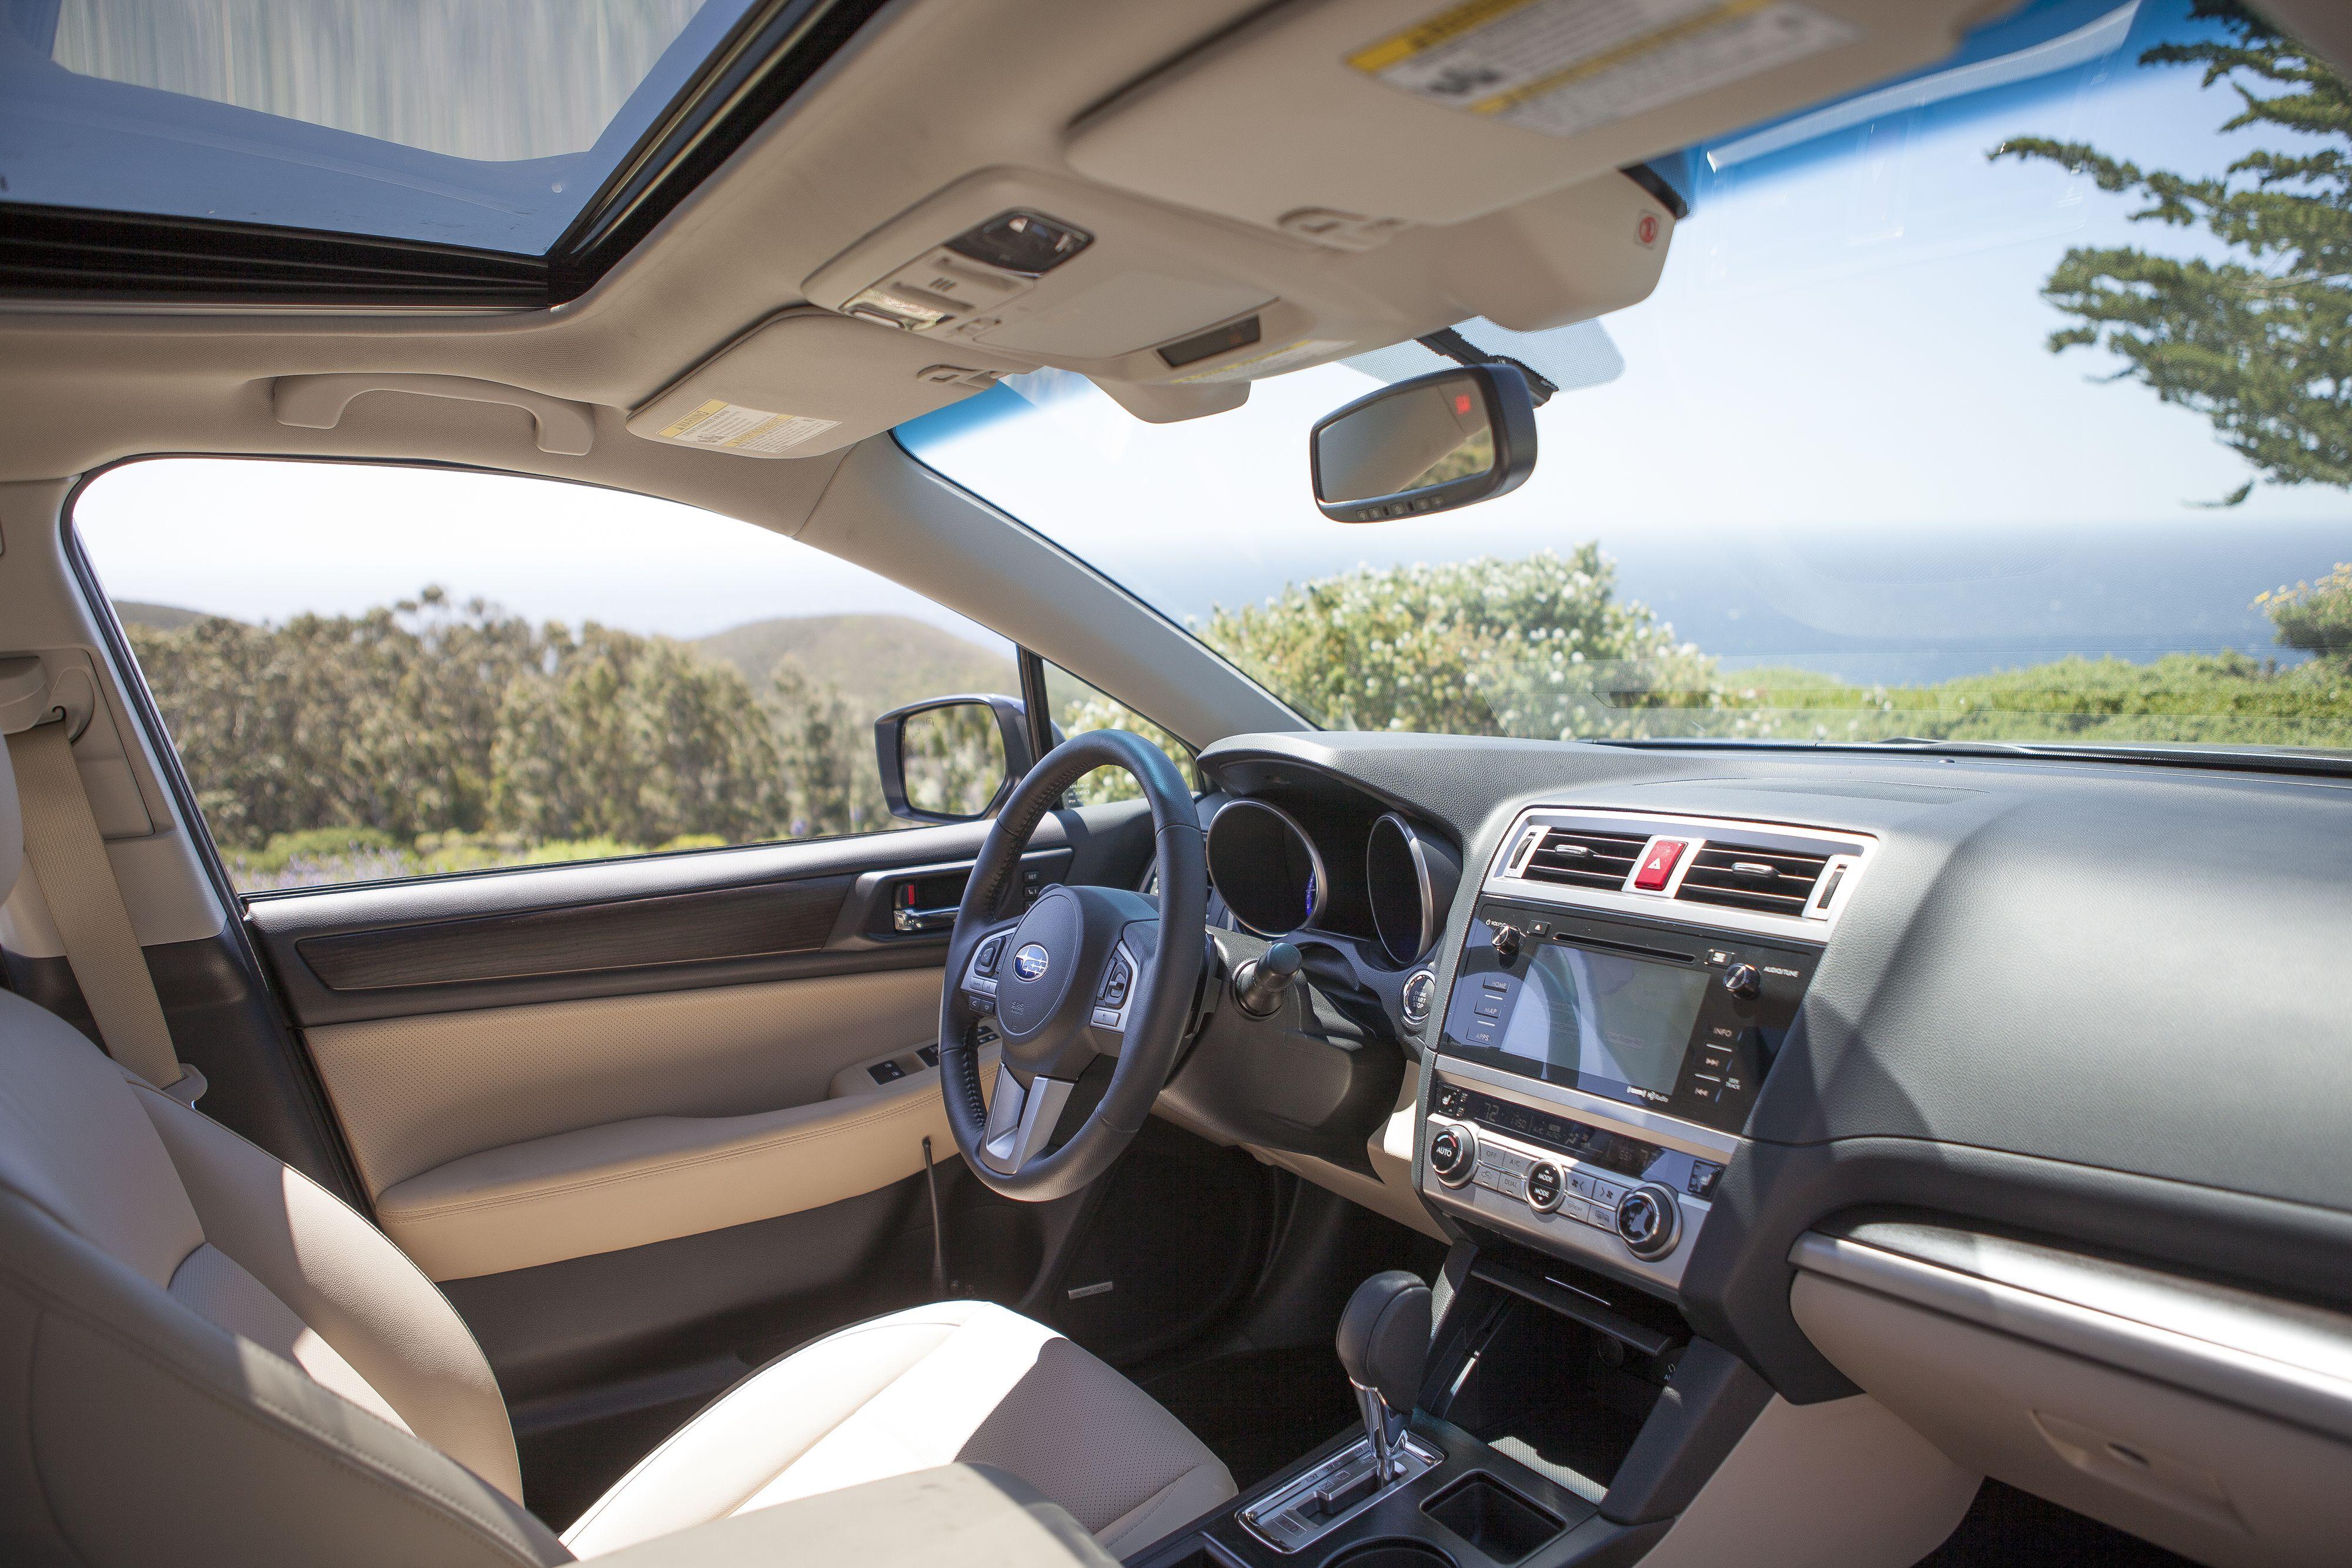 Sacramento Subaru Dealer Maita New Used Subaru Dealership Serving Auburn Roseville Subaru Legacy 2015 Subaru Legacy Used Subaru